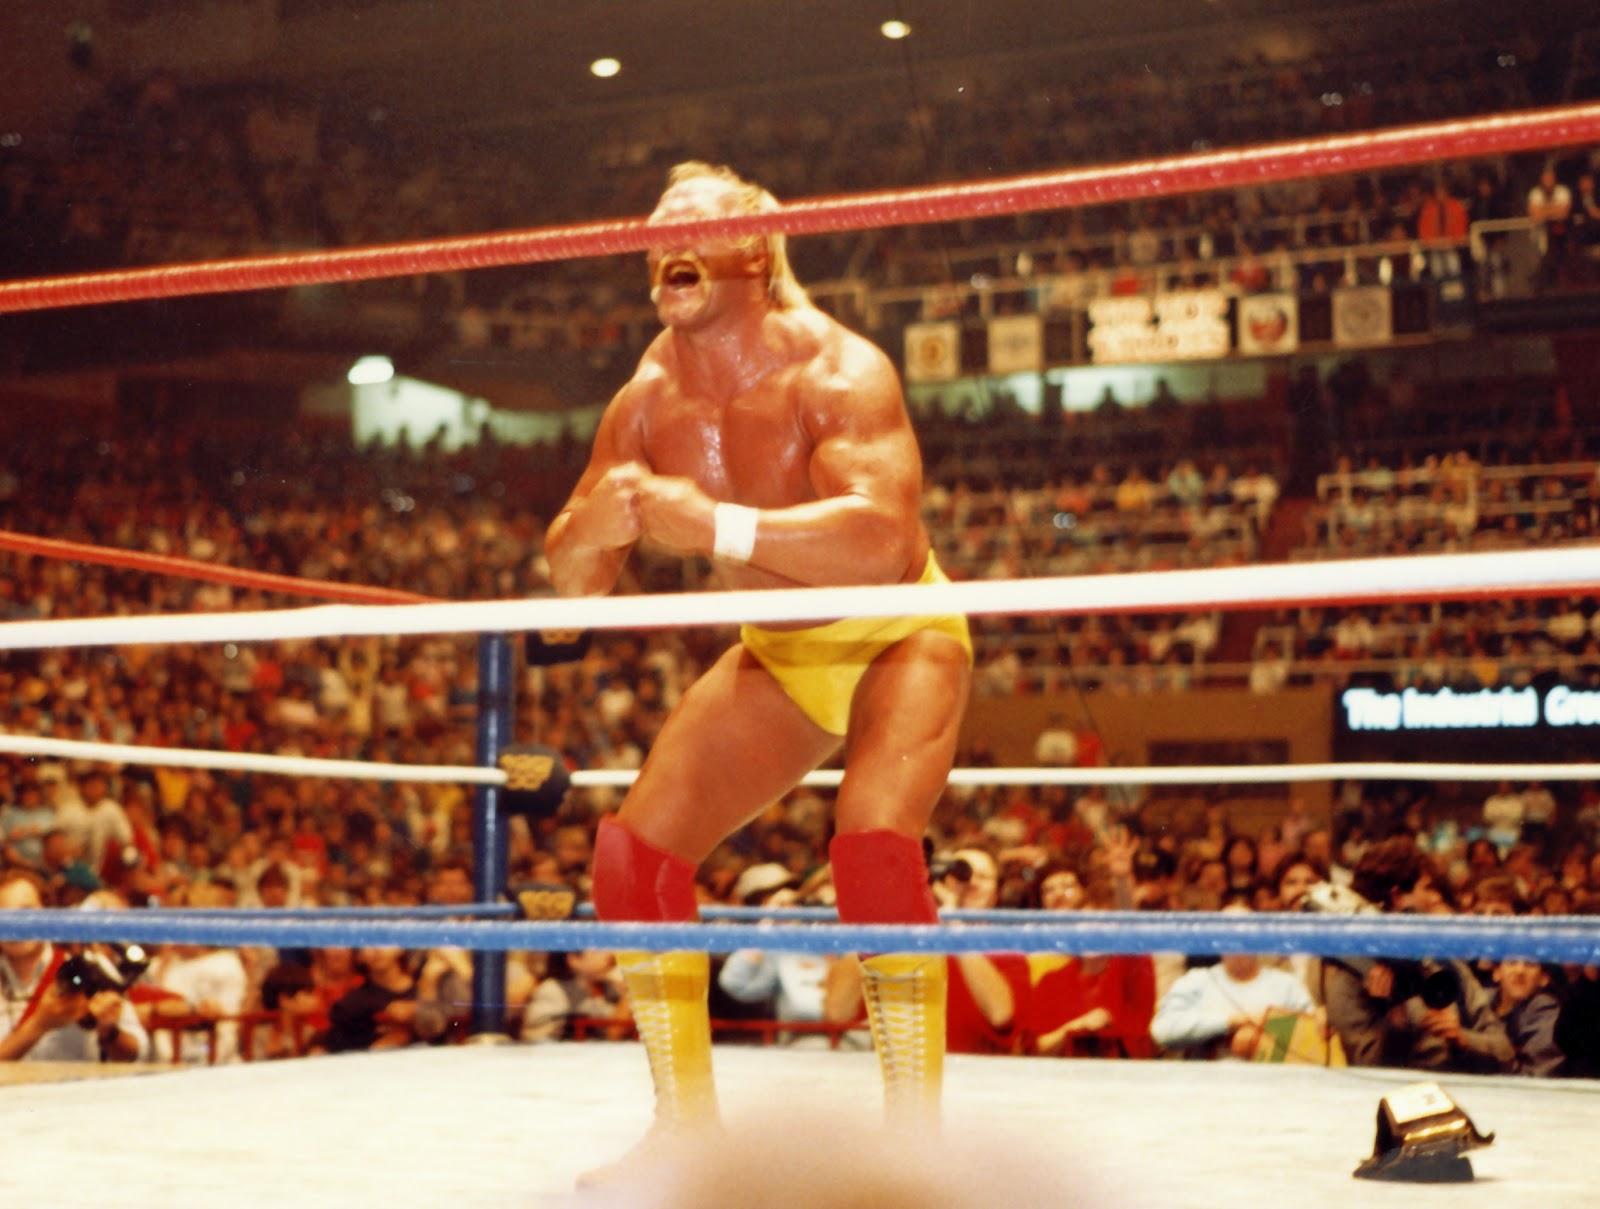 Kamala defeats Hulk Hogan in title match December 1986 in Toronto – Hulk Hogan Birthday Card